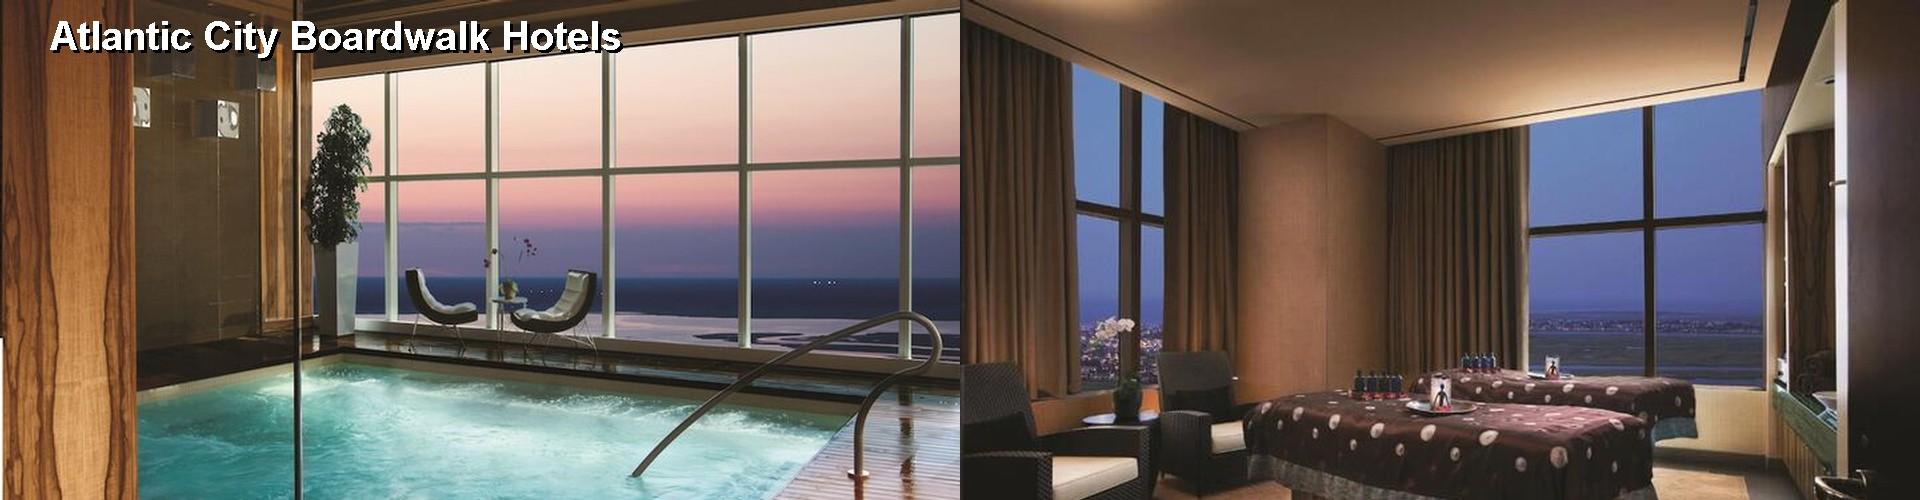 Hotels In Atlantic City >> 60 Closest Hotels Near Atlantic City Boardwalk Nj